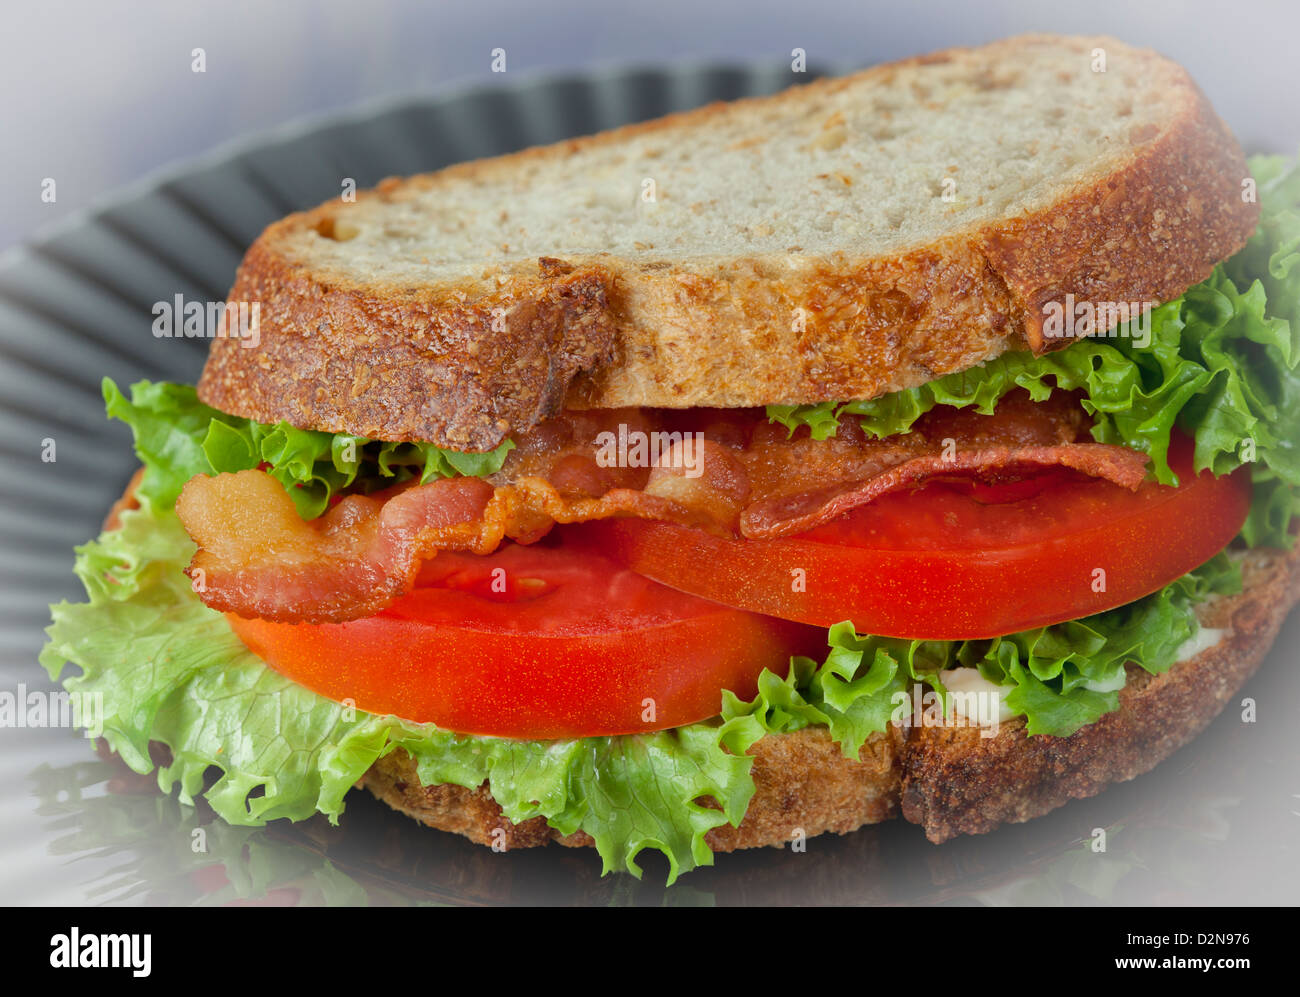 Bacon Lettuce Tomato Sandwich - Stock Image